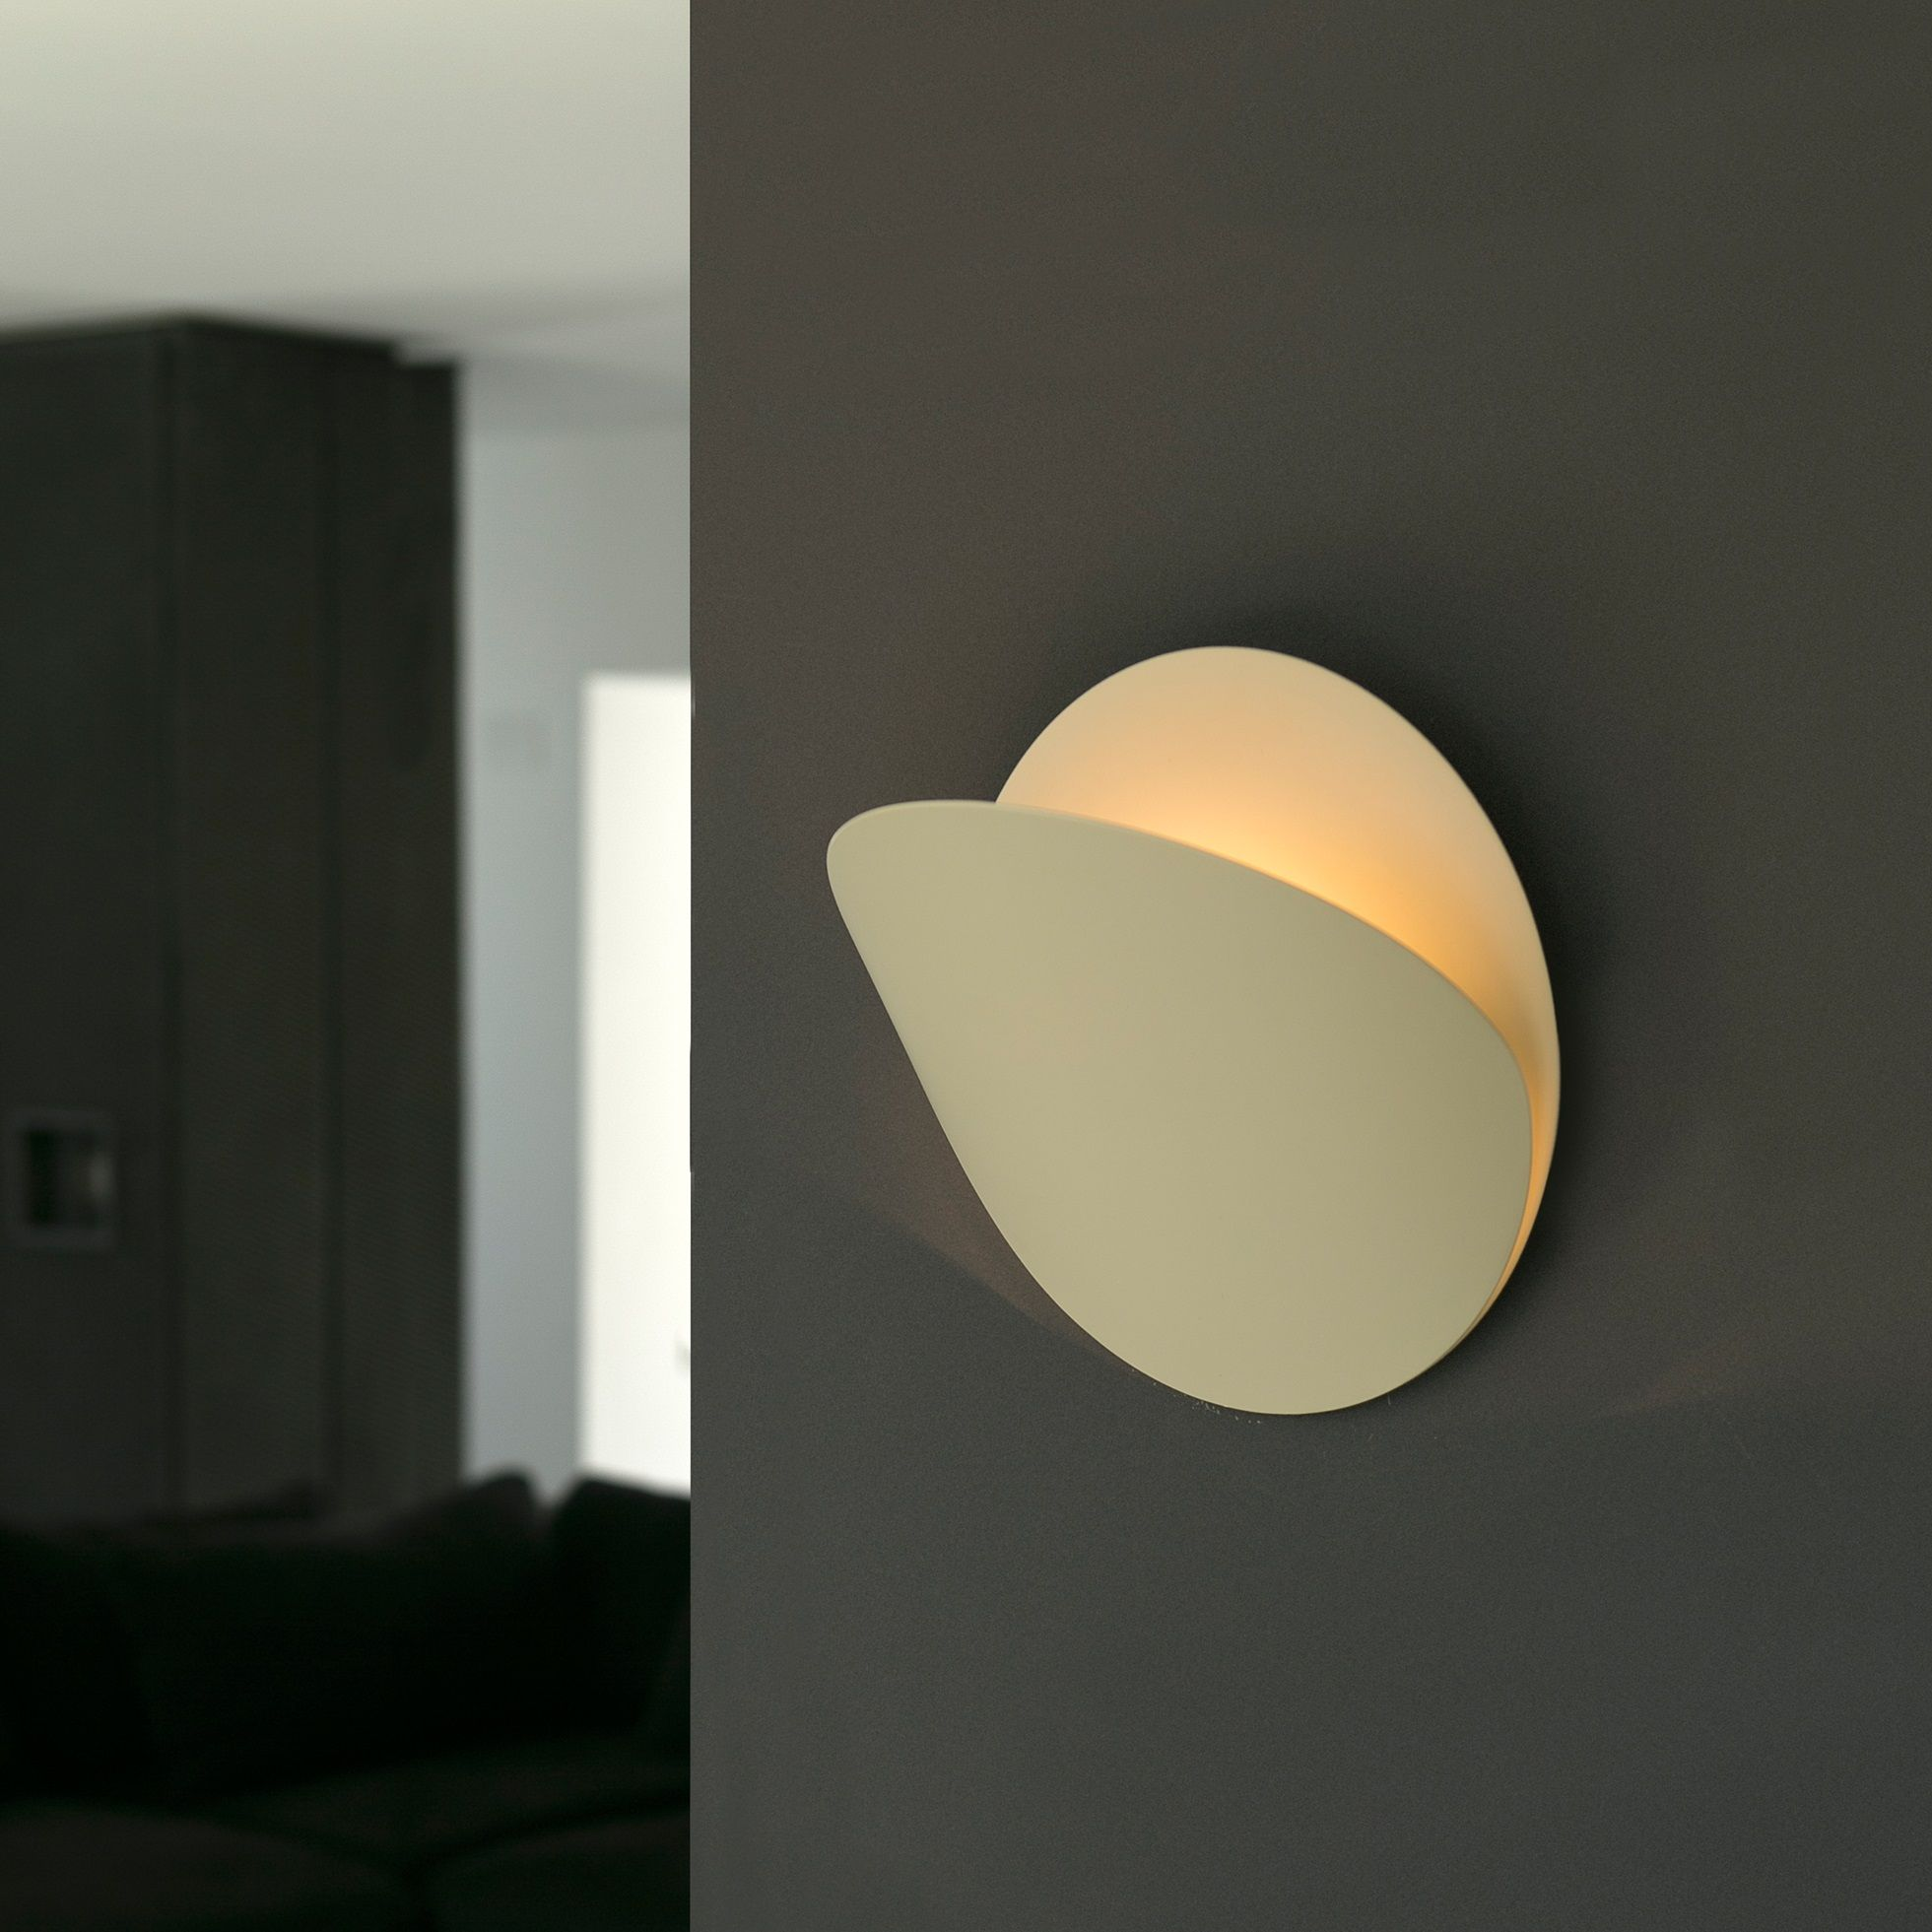 Estudi Ribaudi signe pour Faro une bien jolie lampe murale design ...